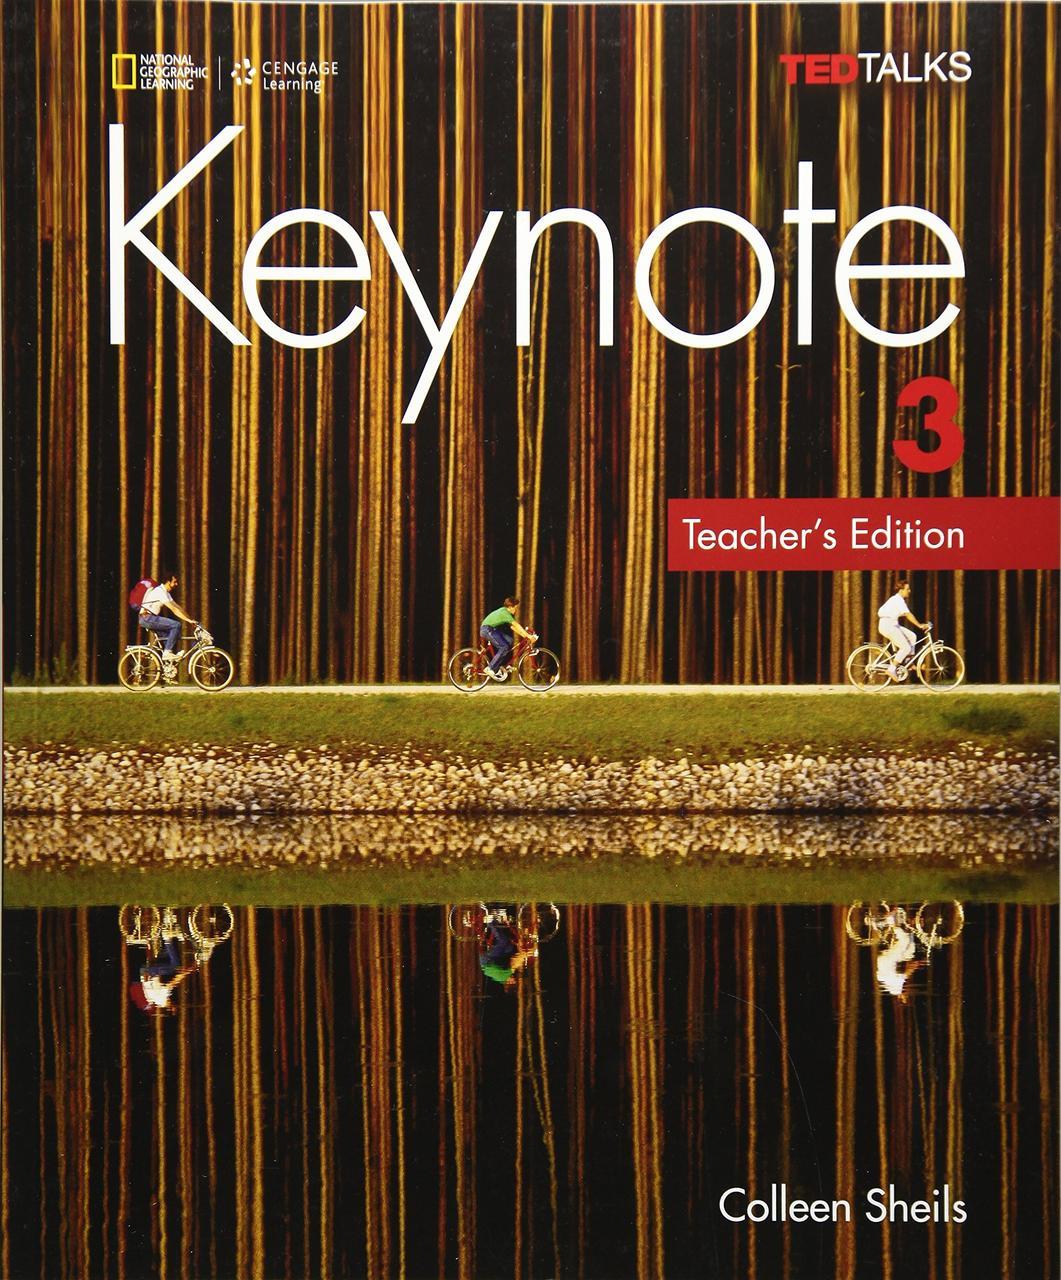 American Keynote 3 Teacher's Edition